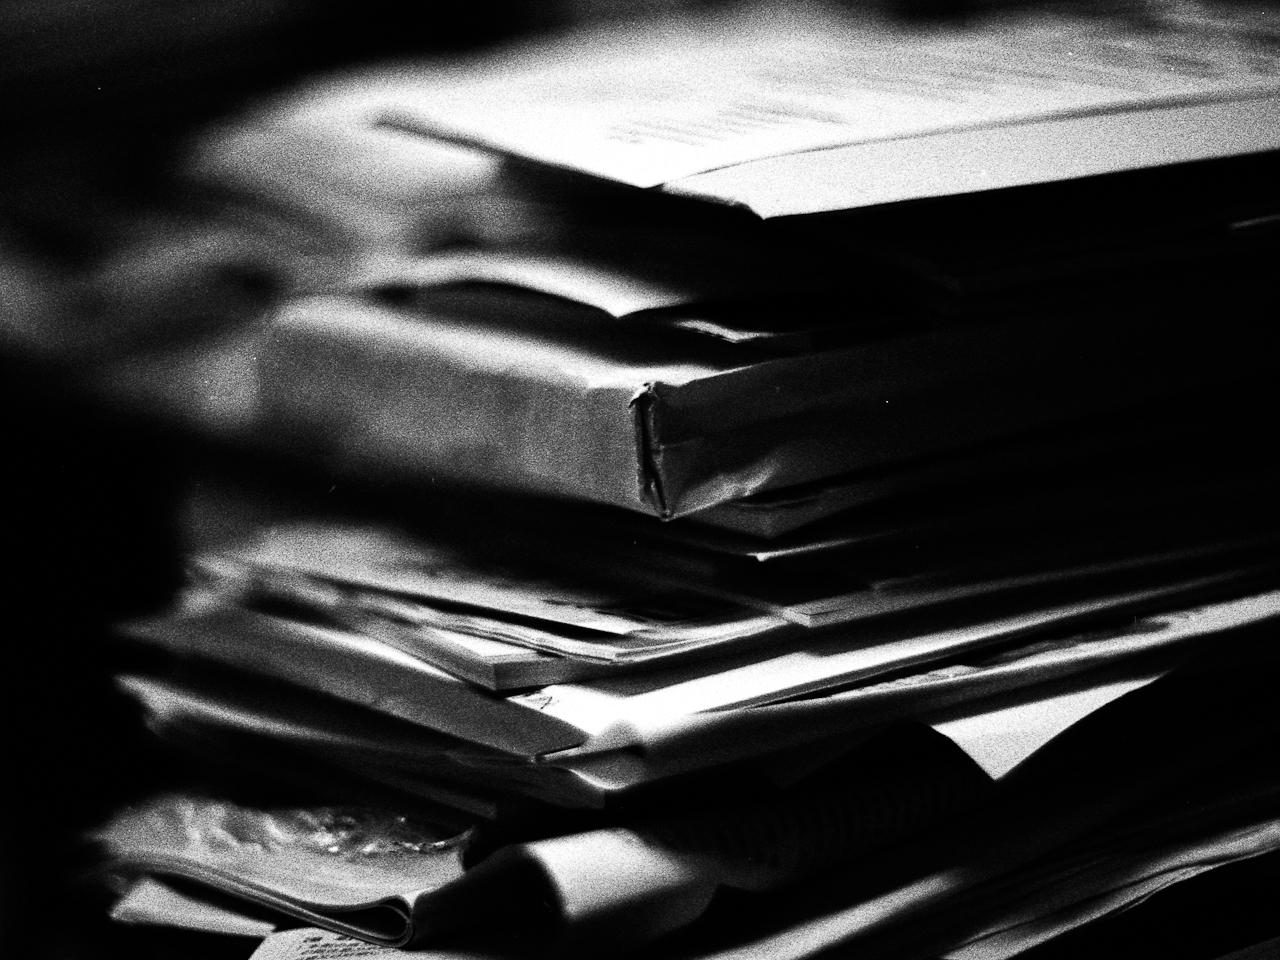 messy paperworks